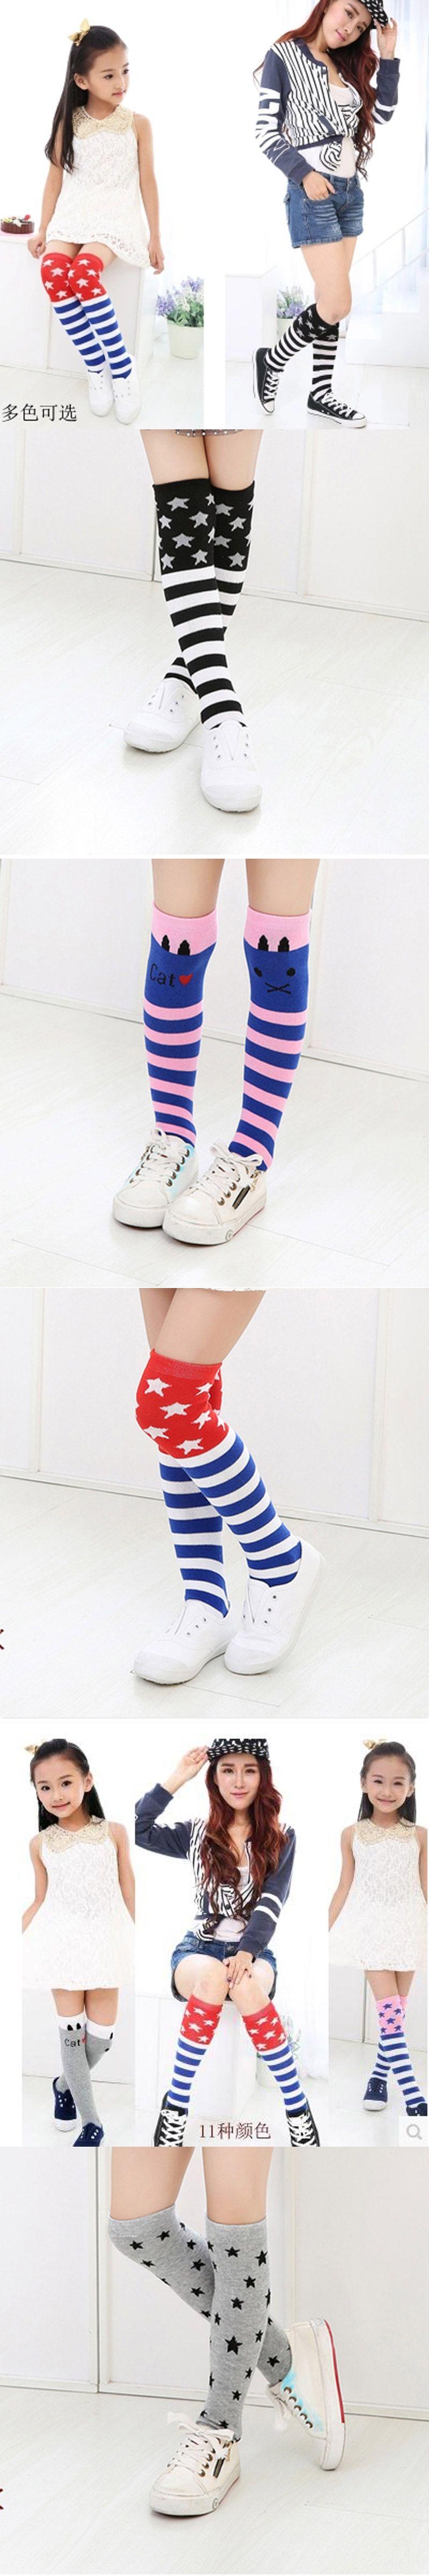 Baby Girl Sock Colorful Striped Cartoon Printed Cute Children s Knee